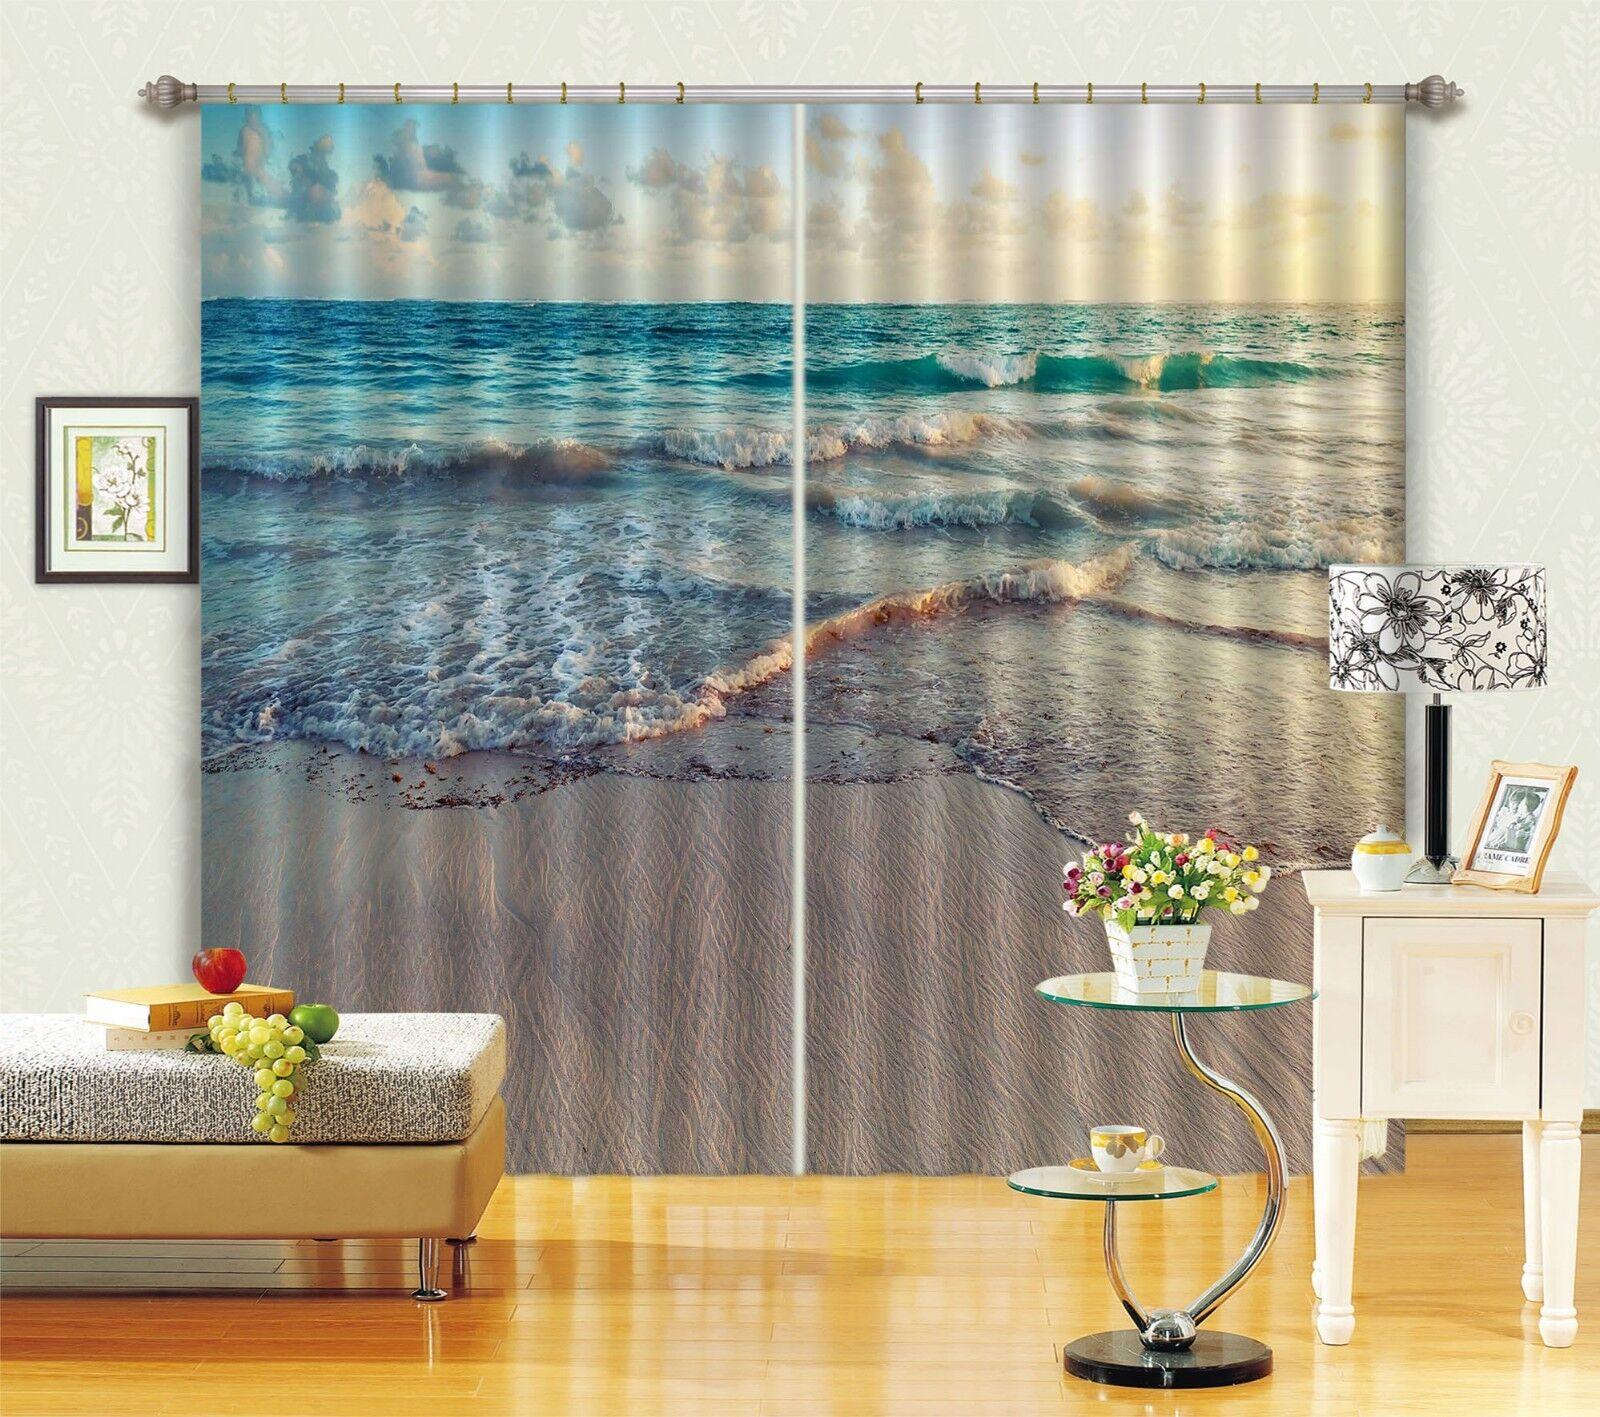 3D Ocean Wave 8 Cortinas de impresión de cortina de foto Blockout Tela Cortinas Ventana CA